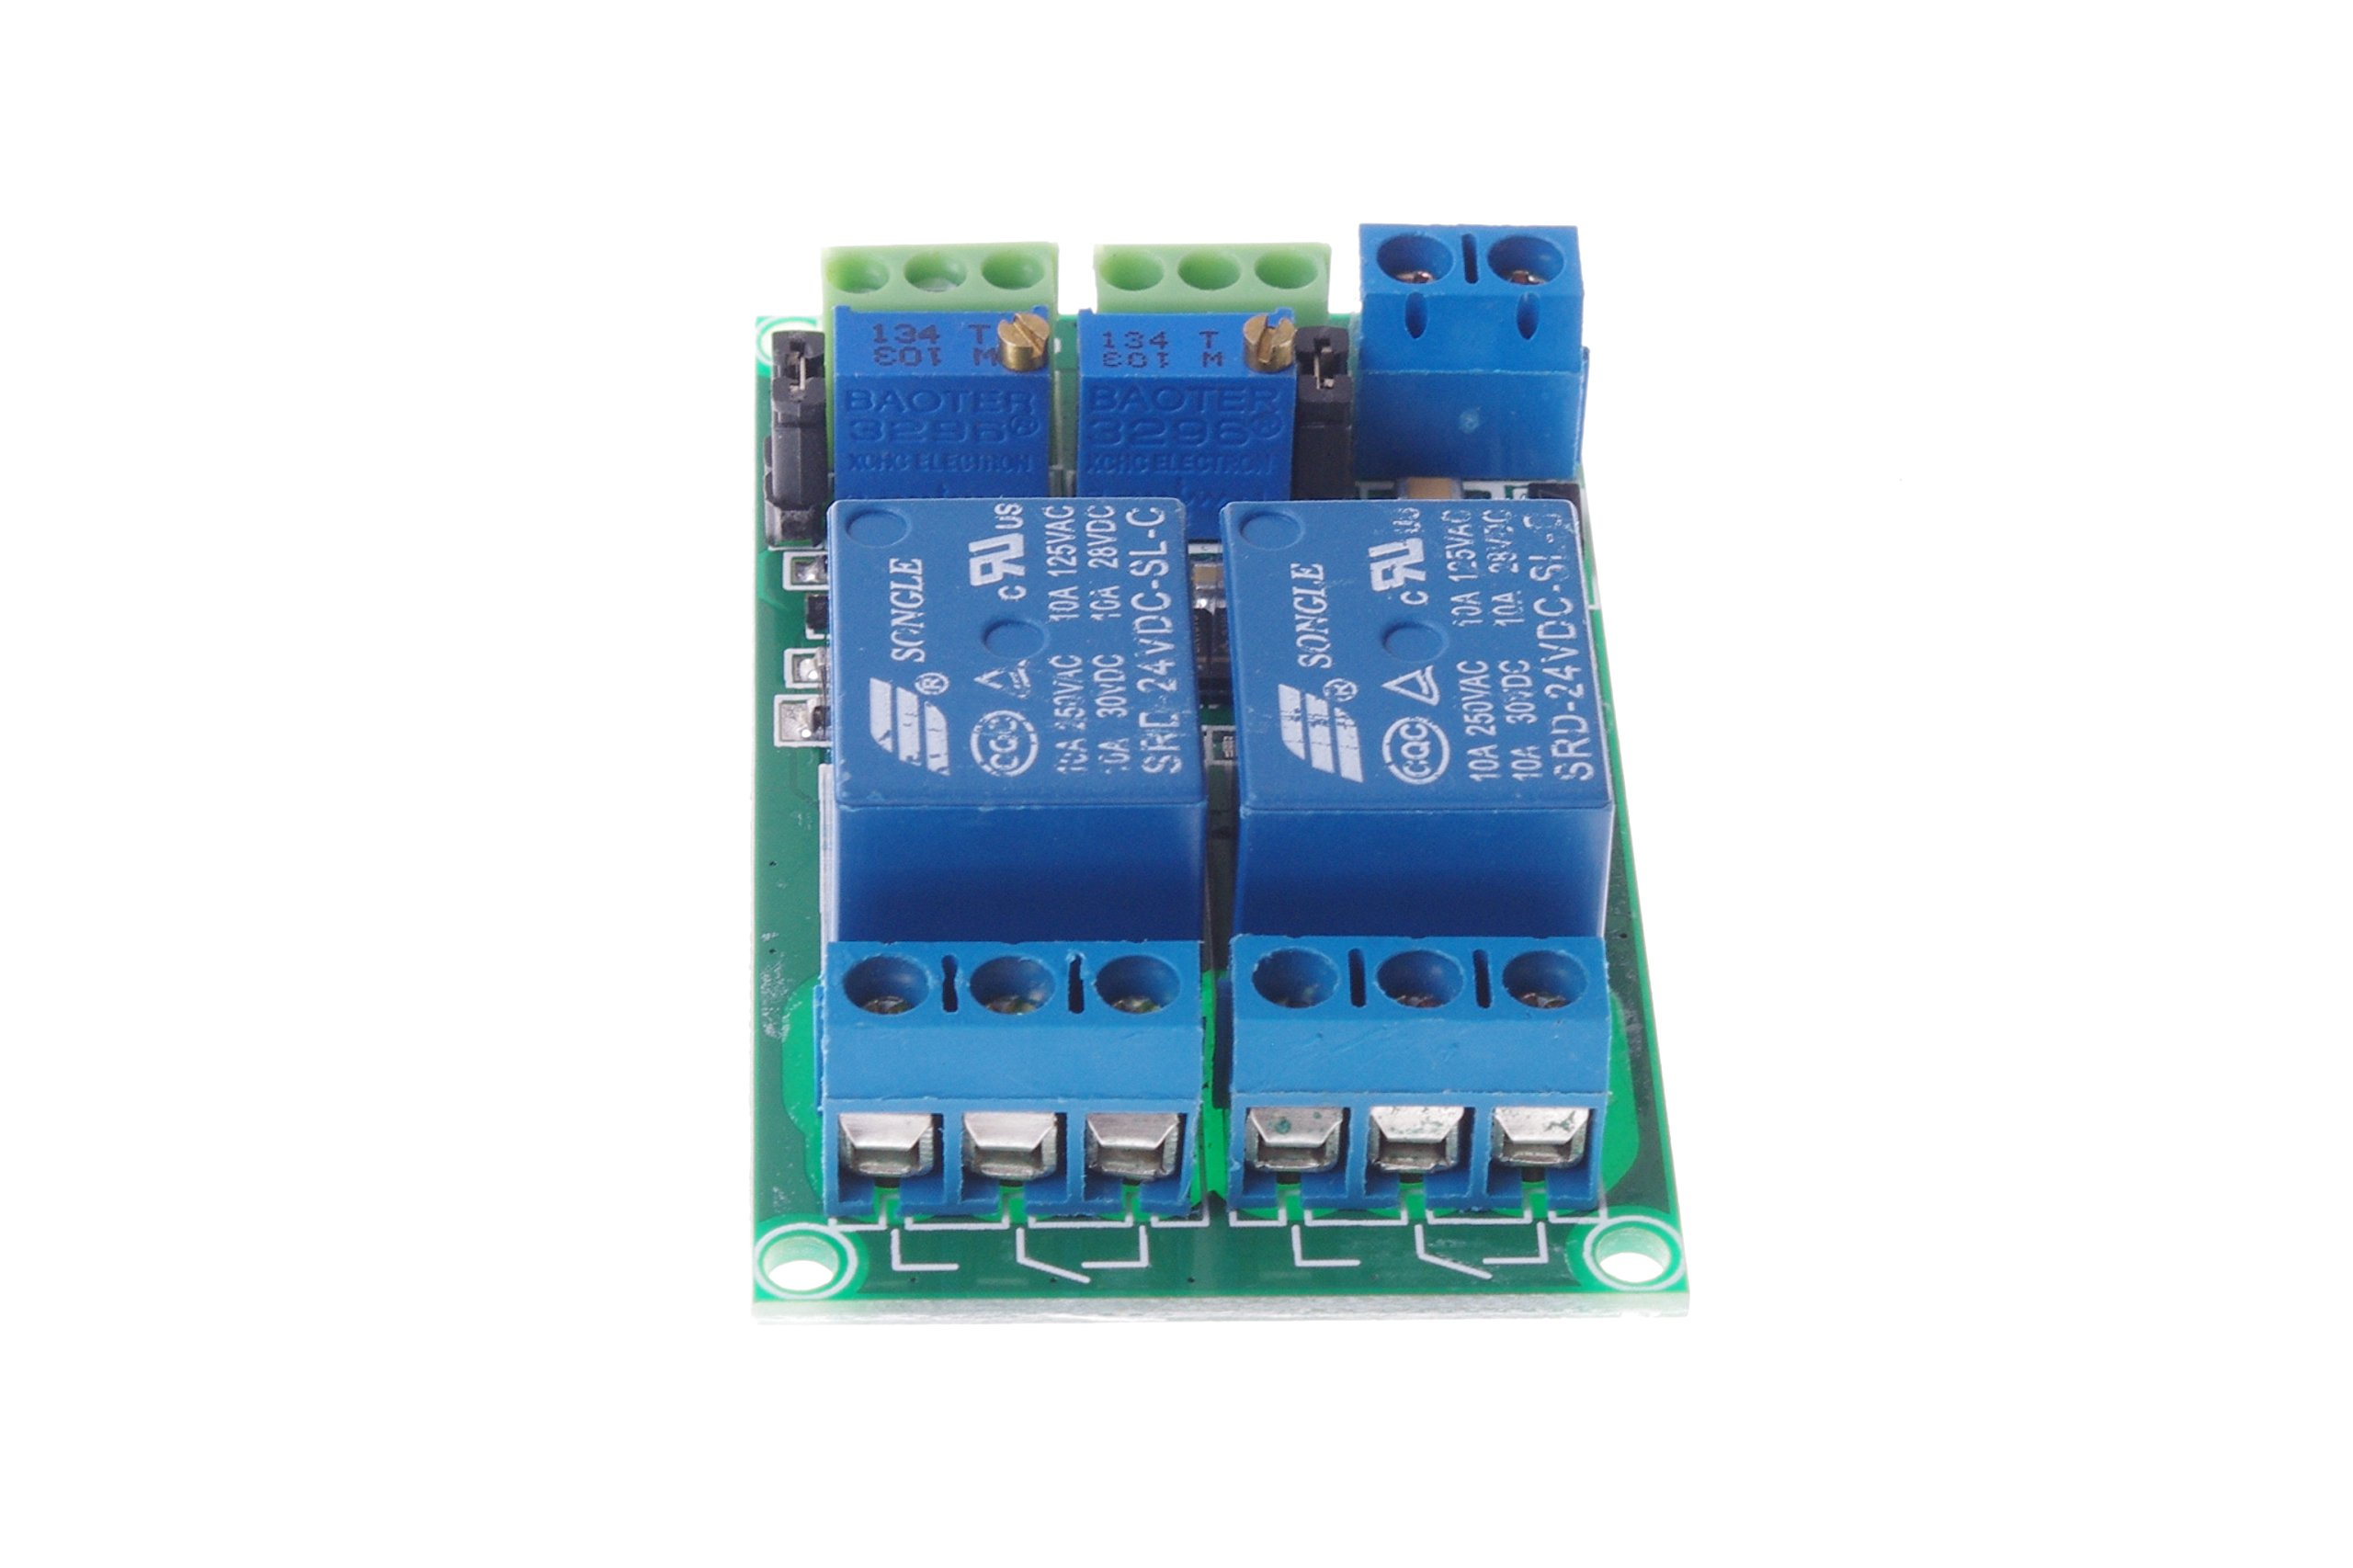 SMAKN® DC 24V 2-Channel Voltage Comparator LM393 Comparator Module